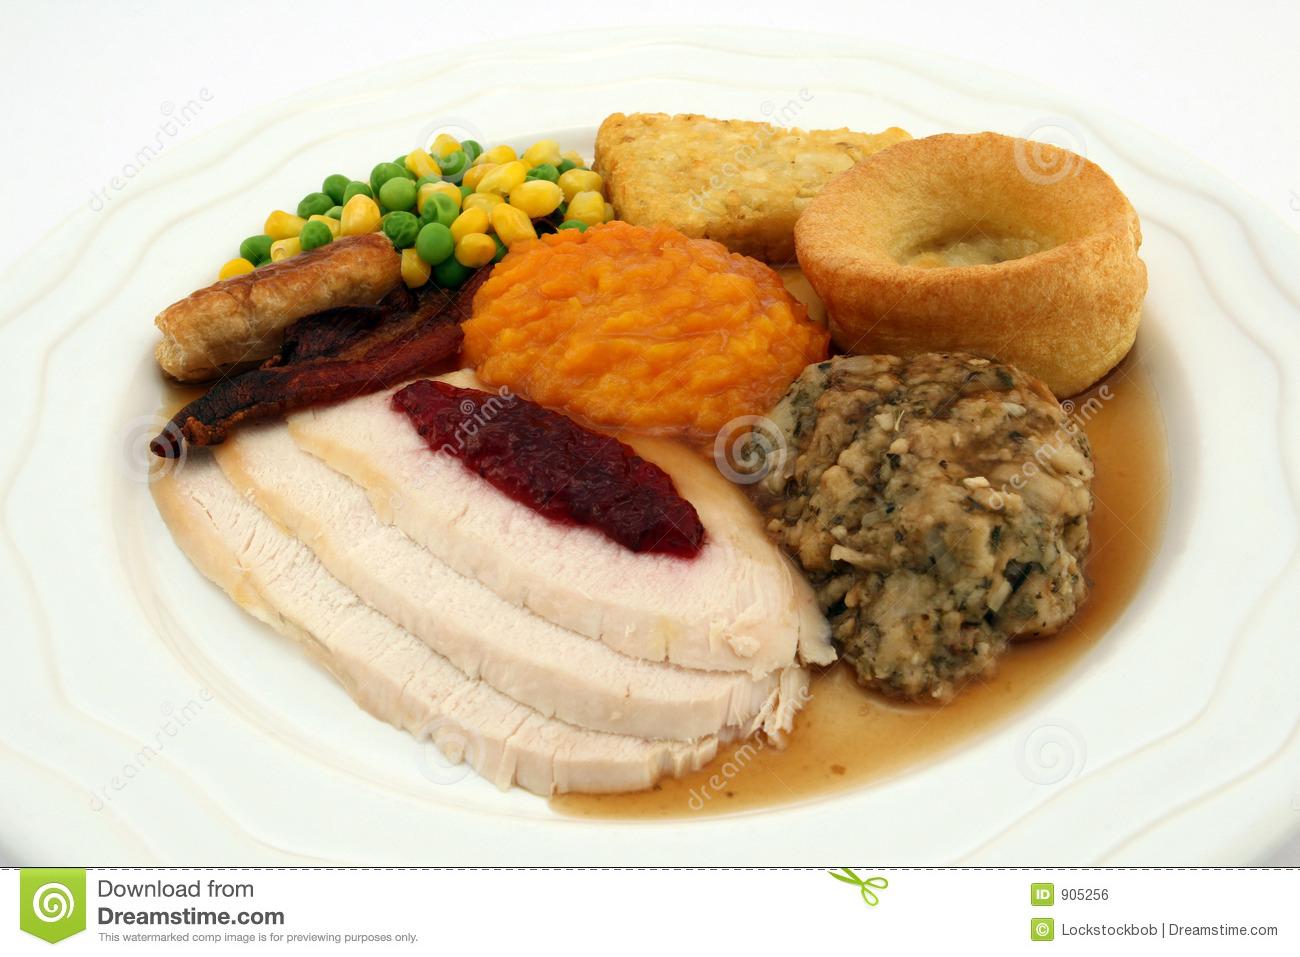 Roast clipart diner (72+) clipart thanksgiving turkey Eating